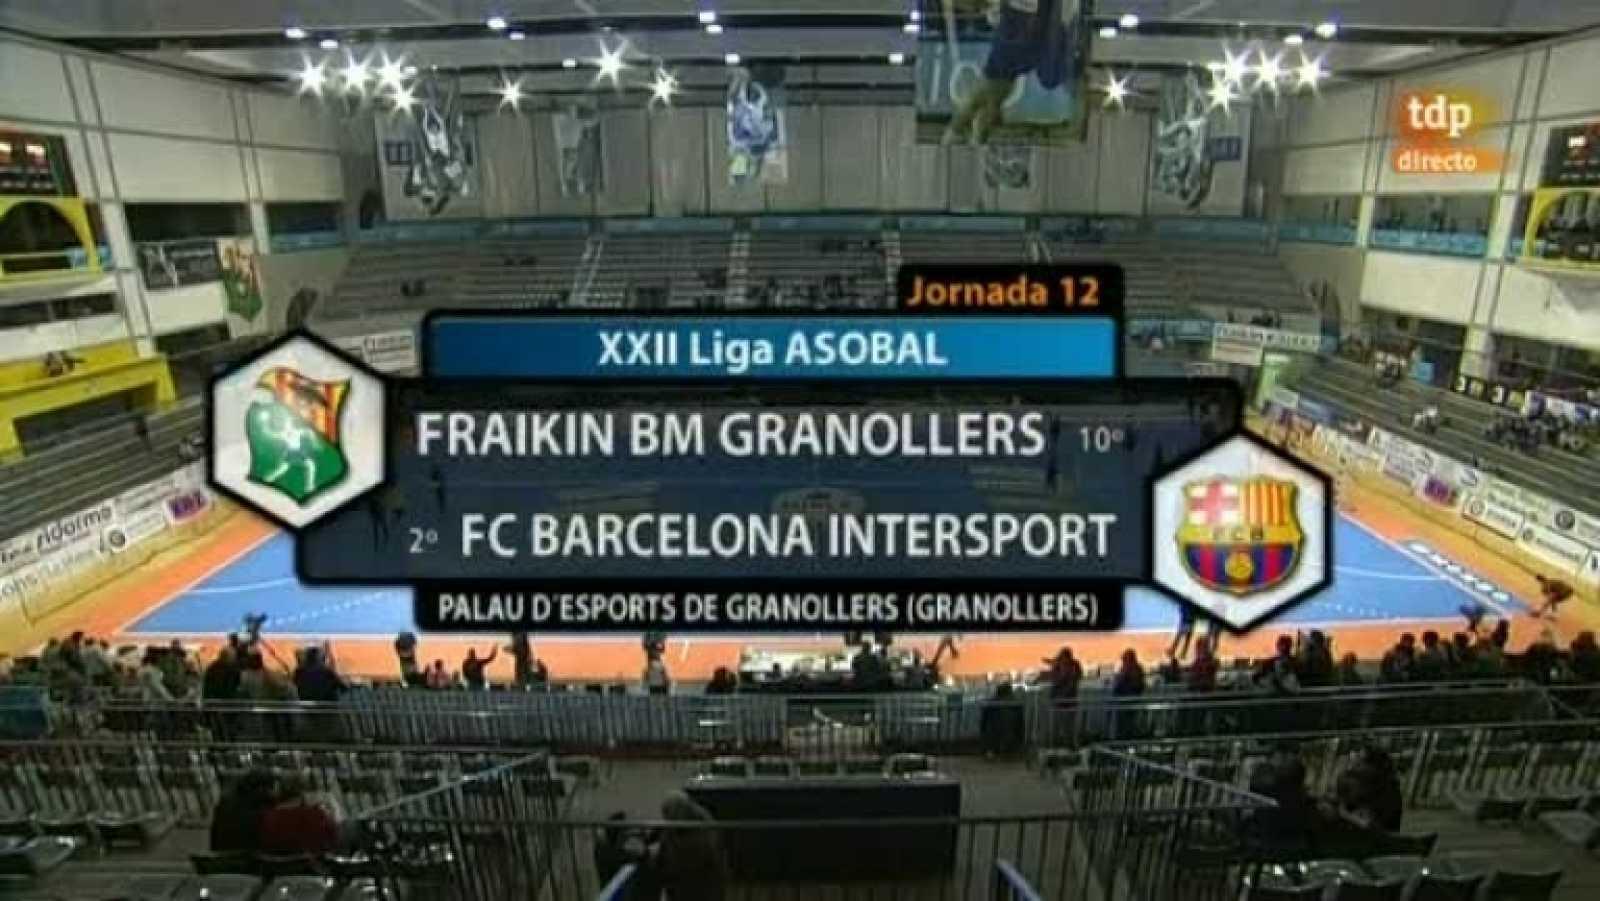 Balonmano - Liga ASOBAL: Fraikin BM Granollers - FC Barcelona Intersport - 30/11/11 - Ver ahora